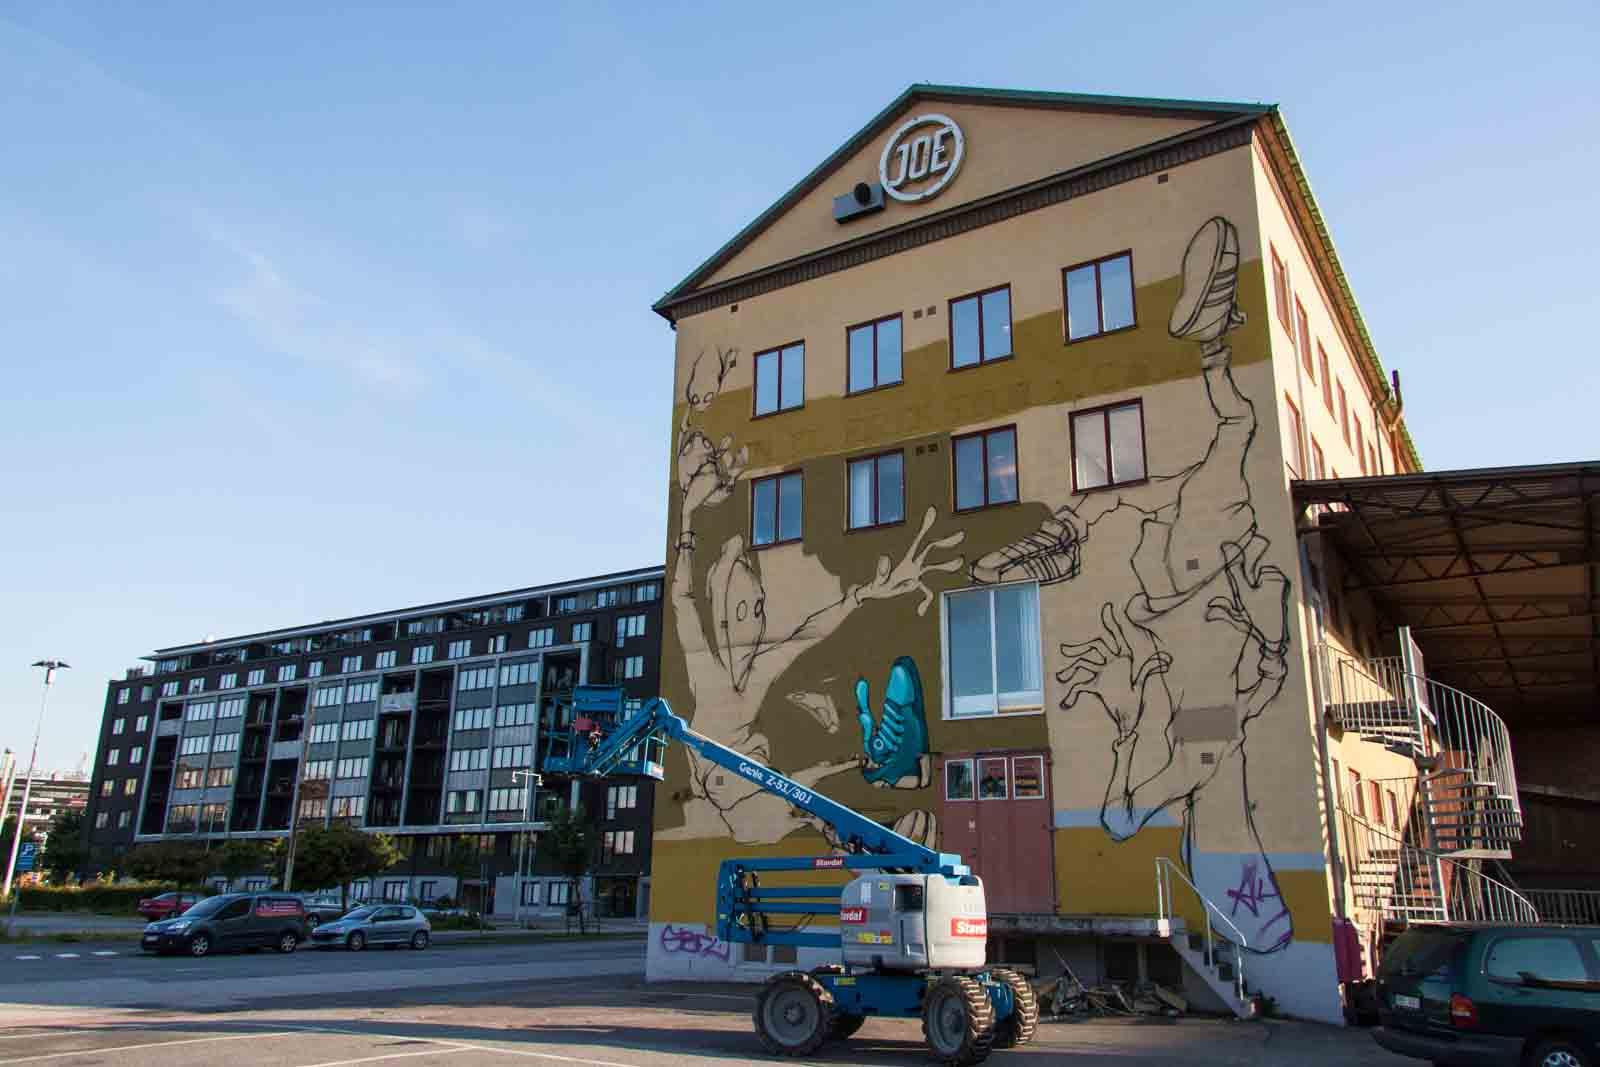 BLESS_Artscape_2016-07-28_FredrikÅkerberg_1600x1067_43.jpg